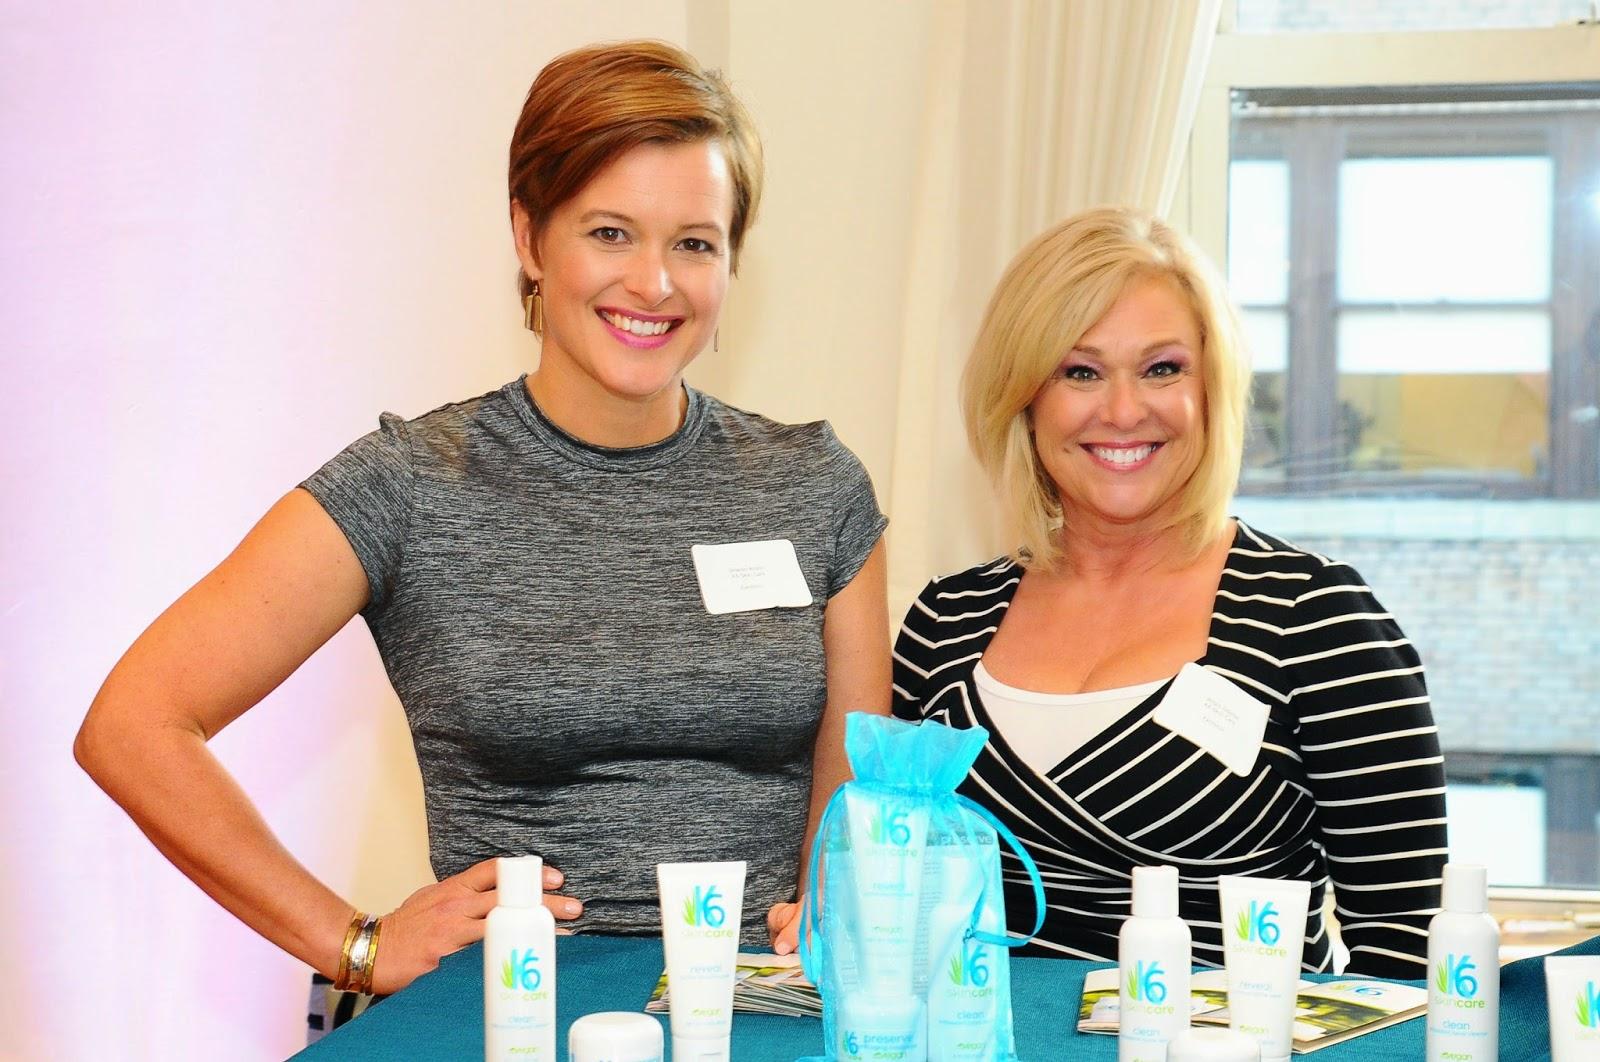 K6 Skincare, Sharon Krahn, Traditional Naturopath, Naturopathic Skincare